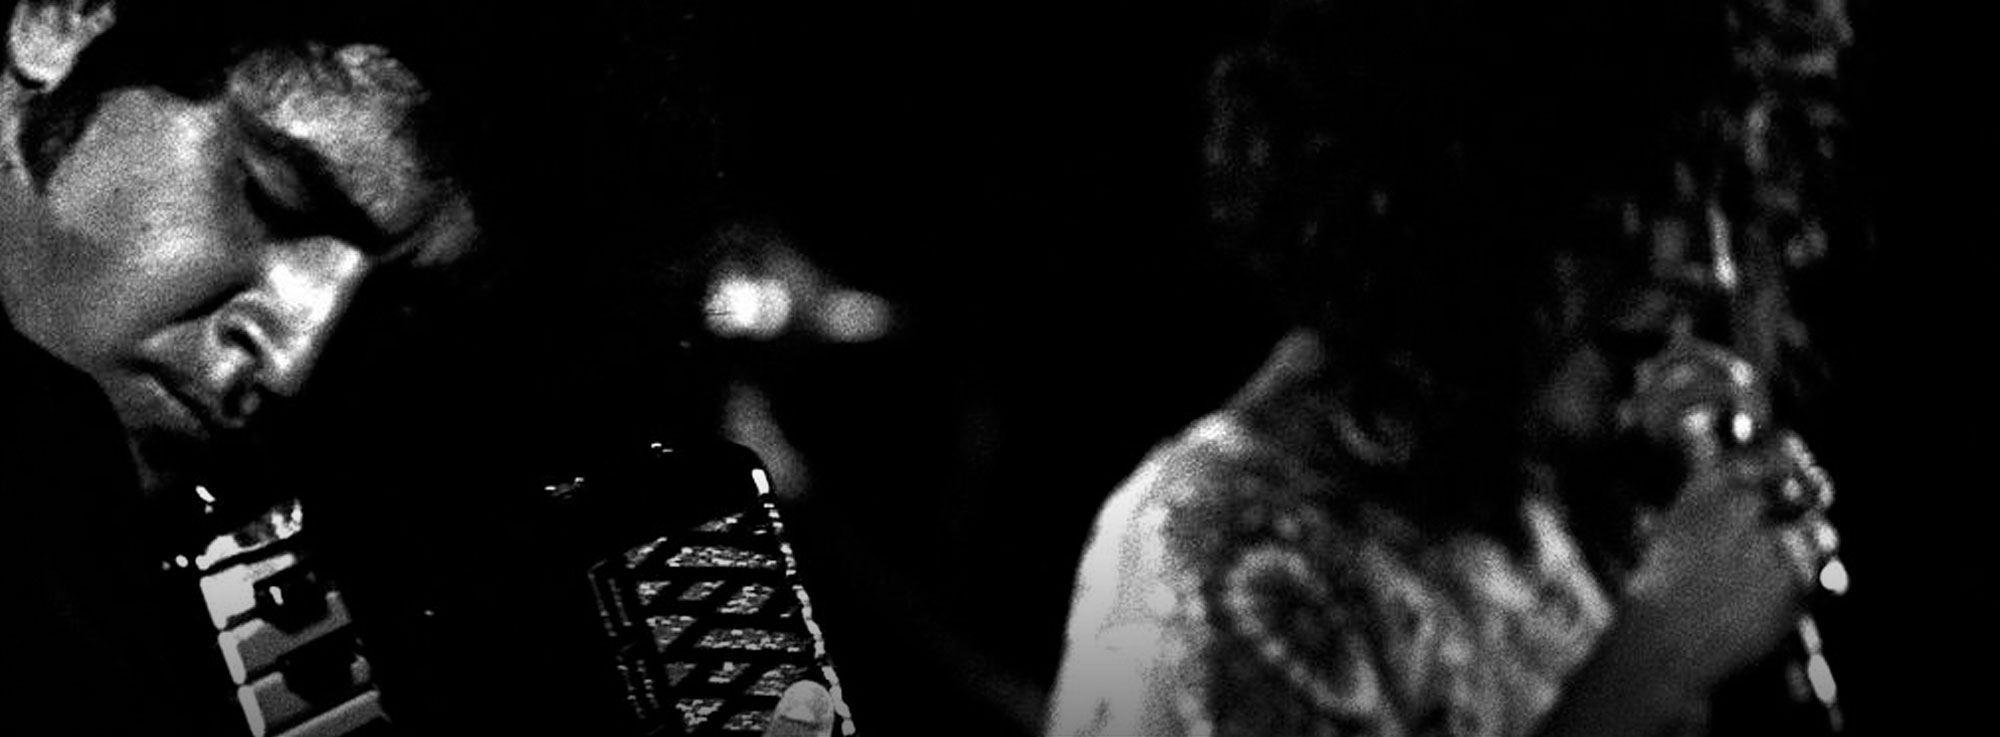 Molfetta: Serata jazz con Paola Arnesano